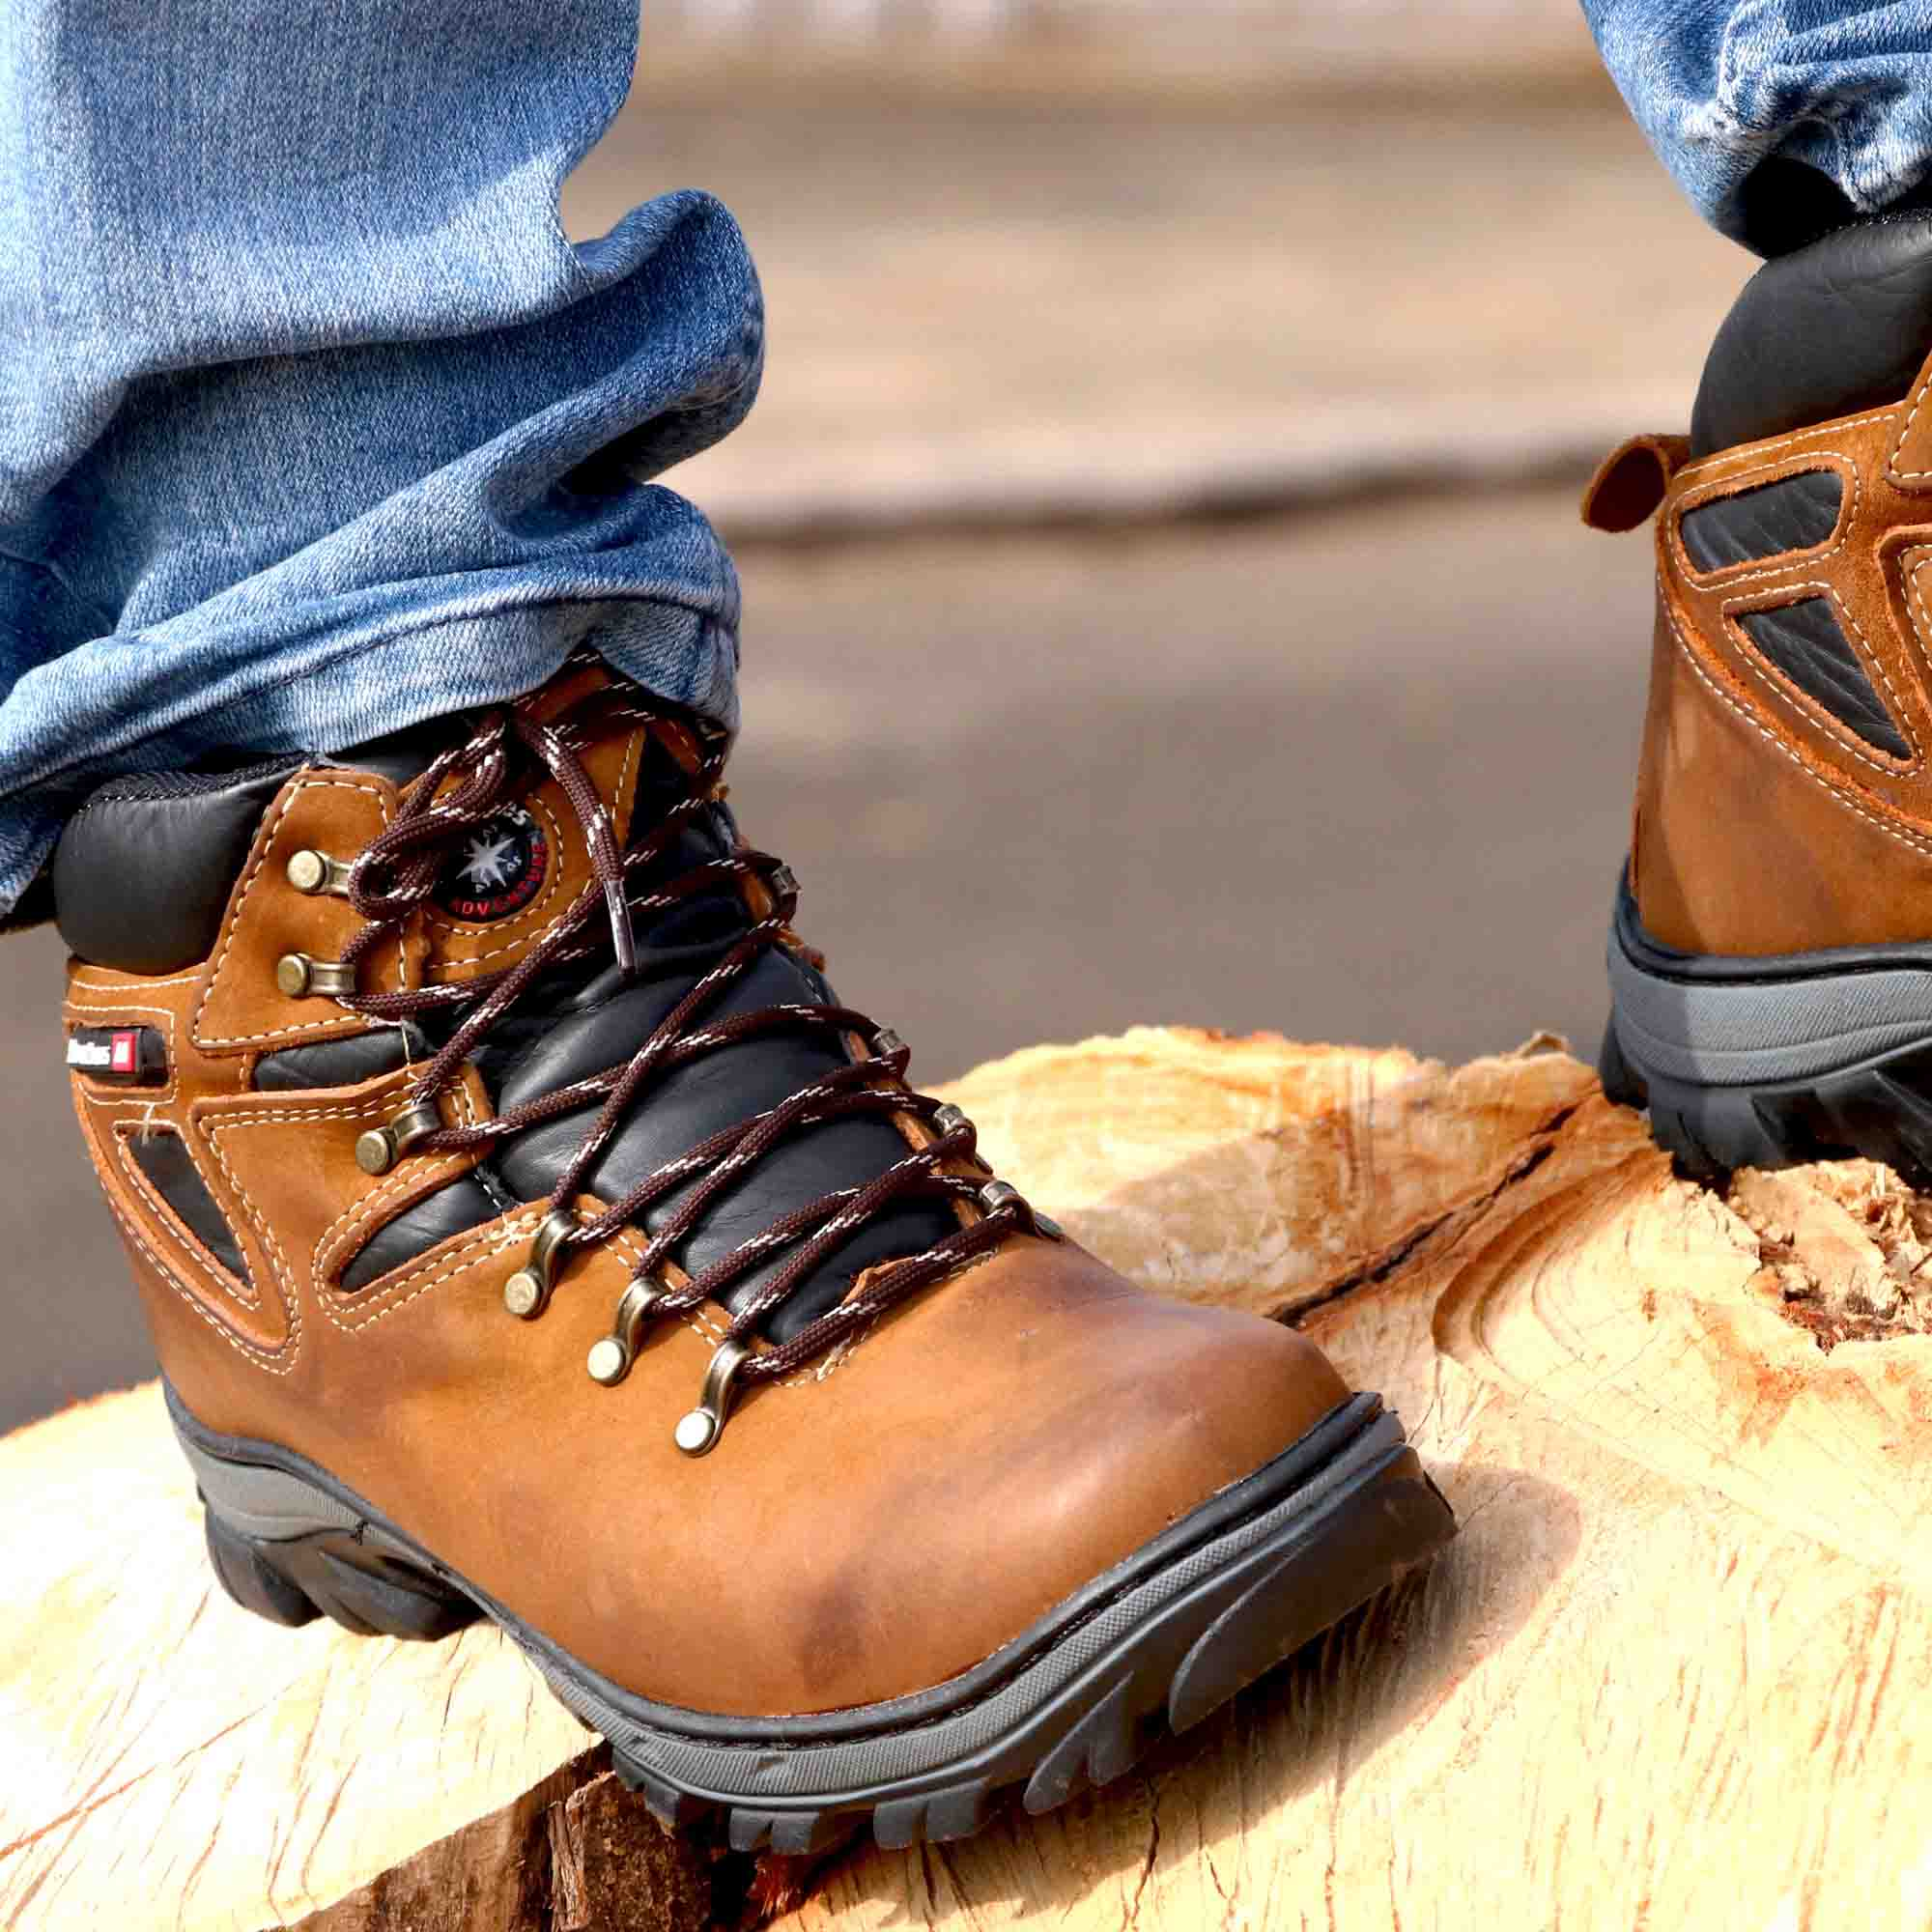 Coturno adventure para trilha Atron Shoes 254